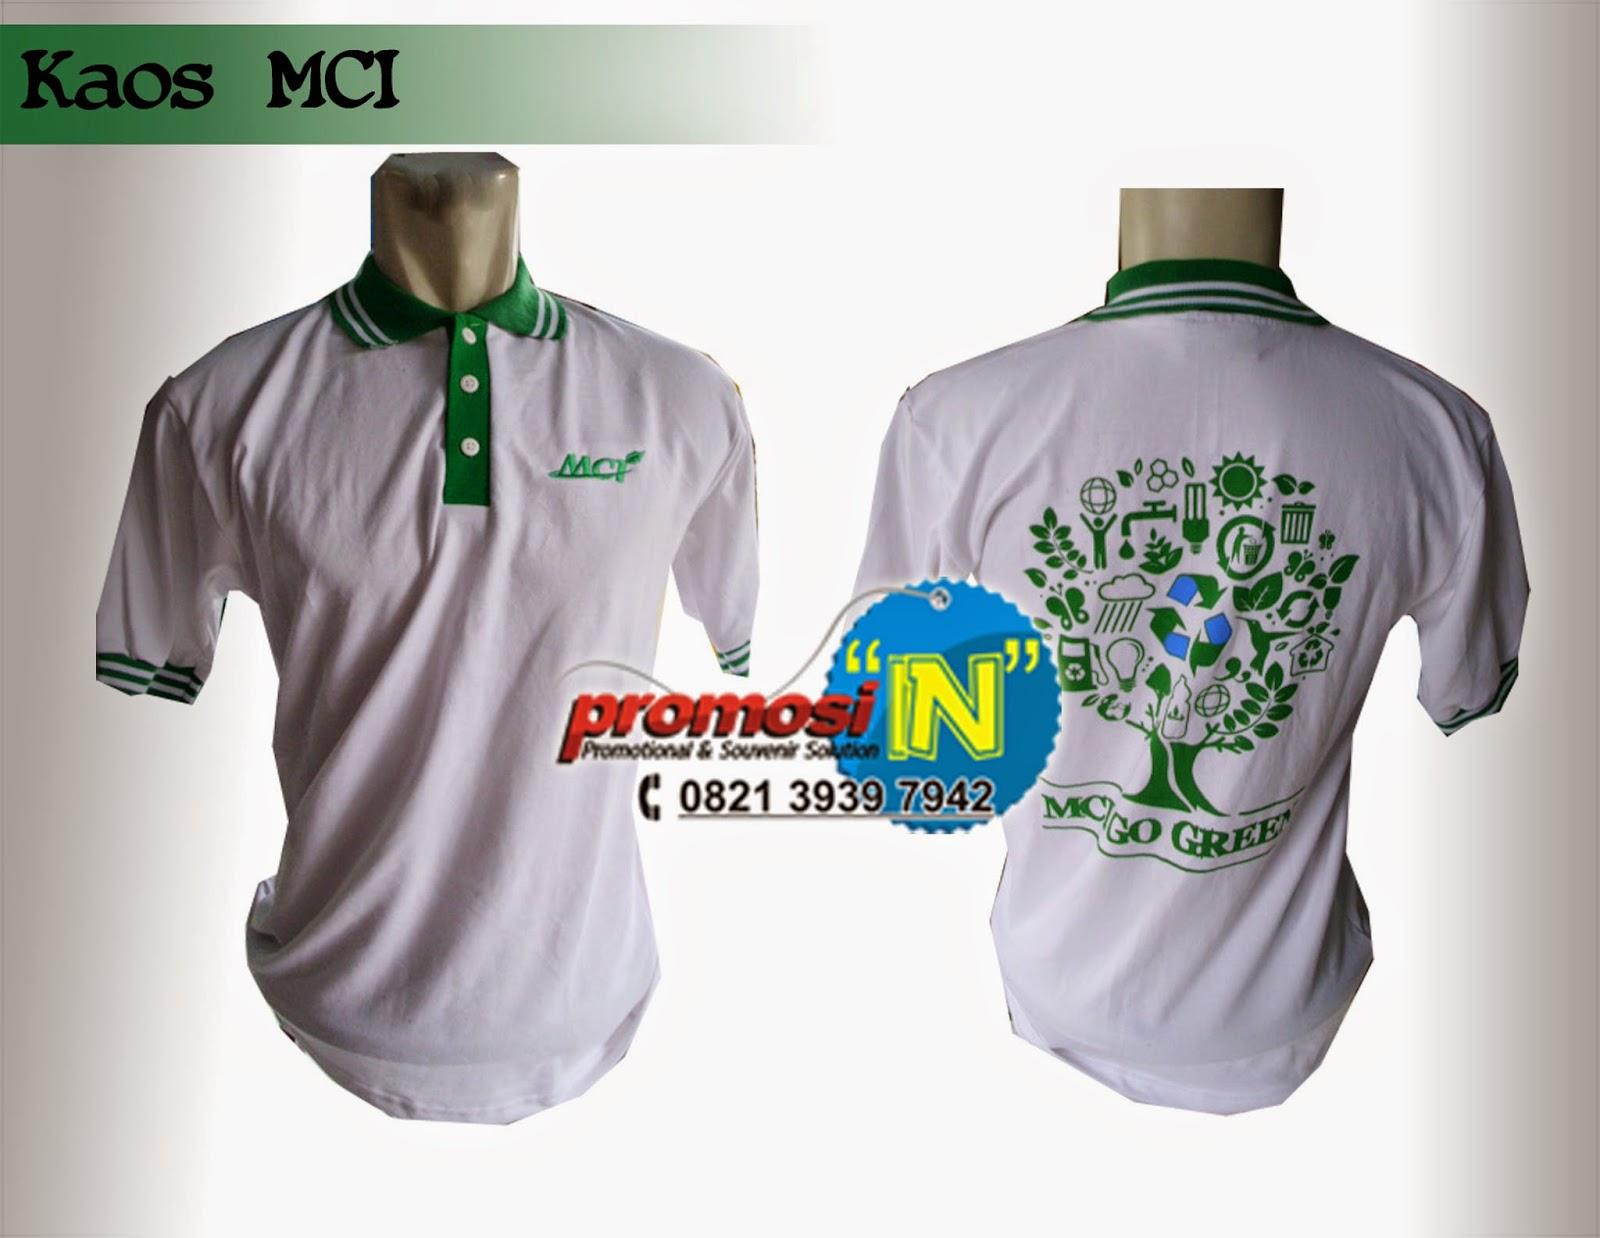 Kaos,Supplier Kaos Promosi,Buat Kaos Online,Bikin Kaos Desain Sendiri,Produksi Kaos Surabaya